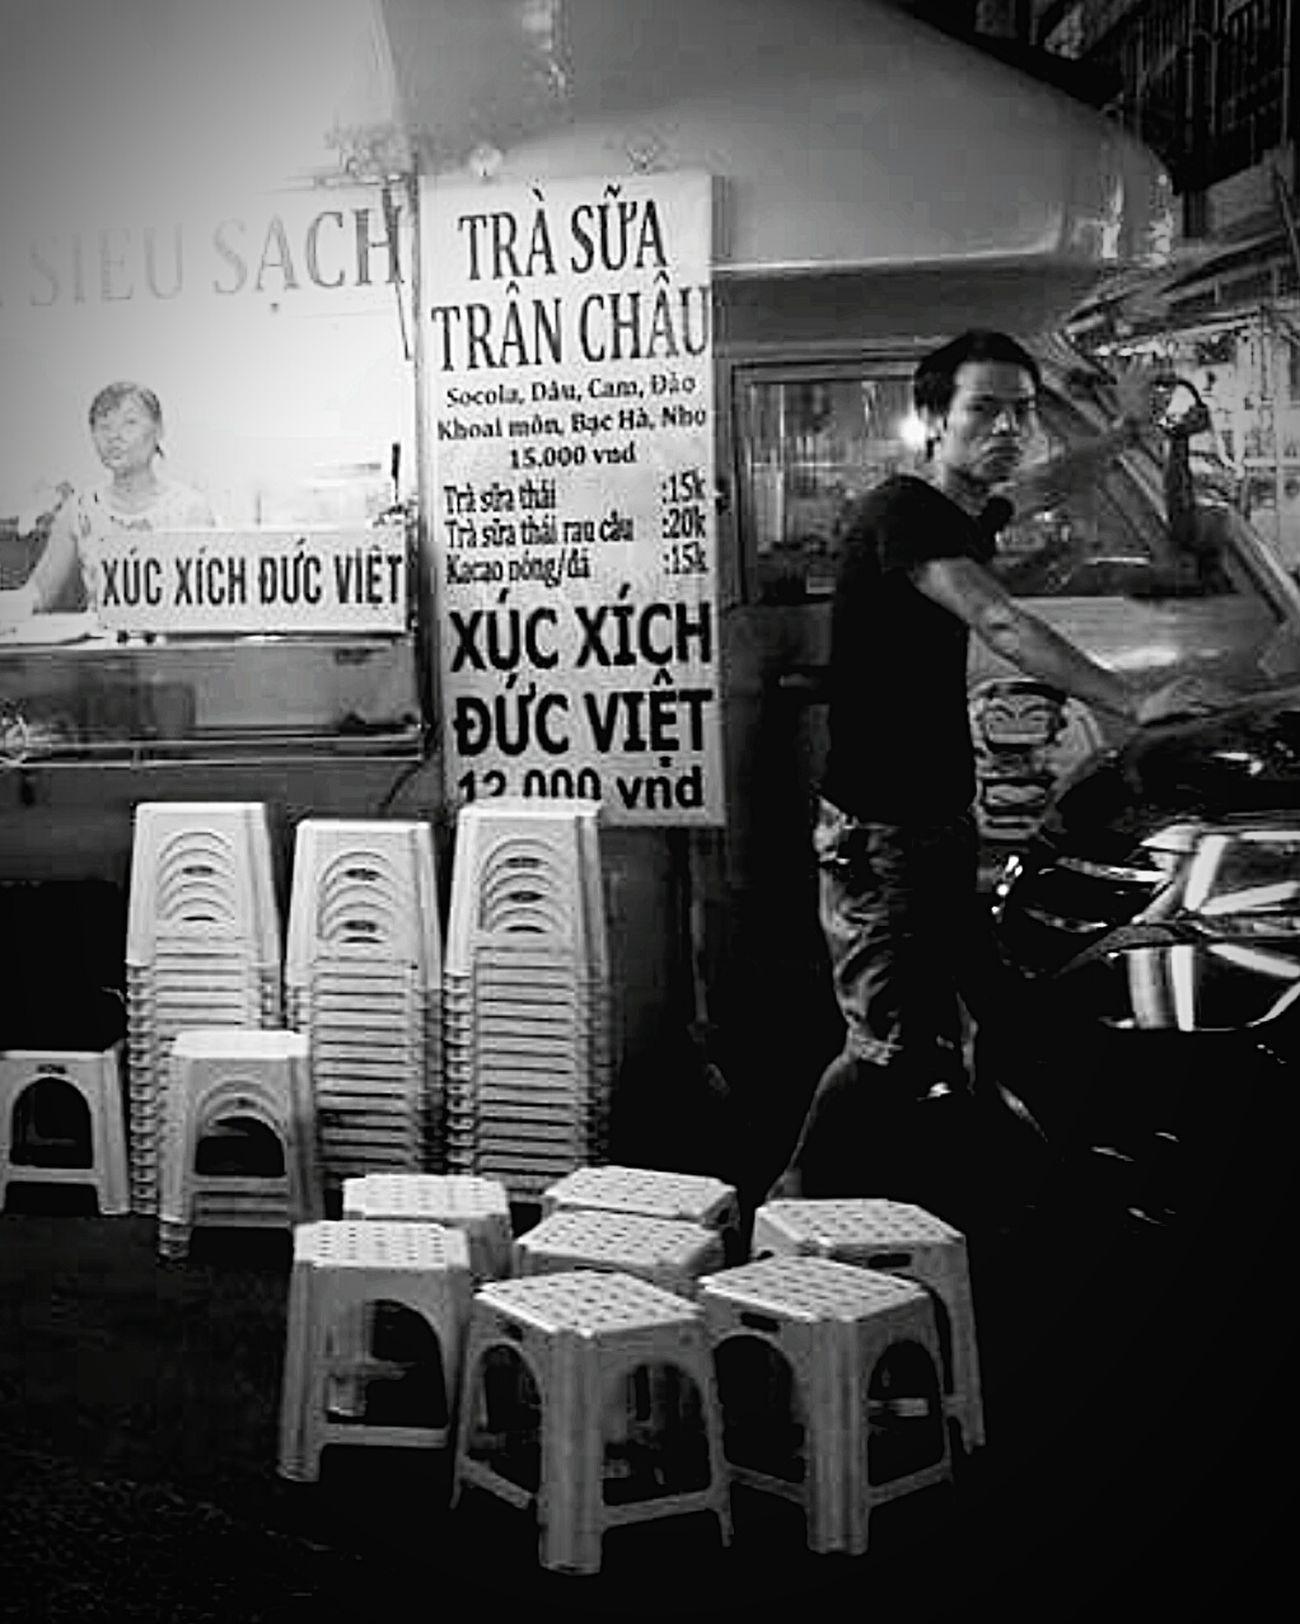 Beverage Stall Night Hanoi Vietnam Travelphotography Streetphotography